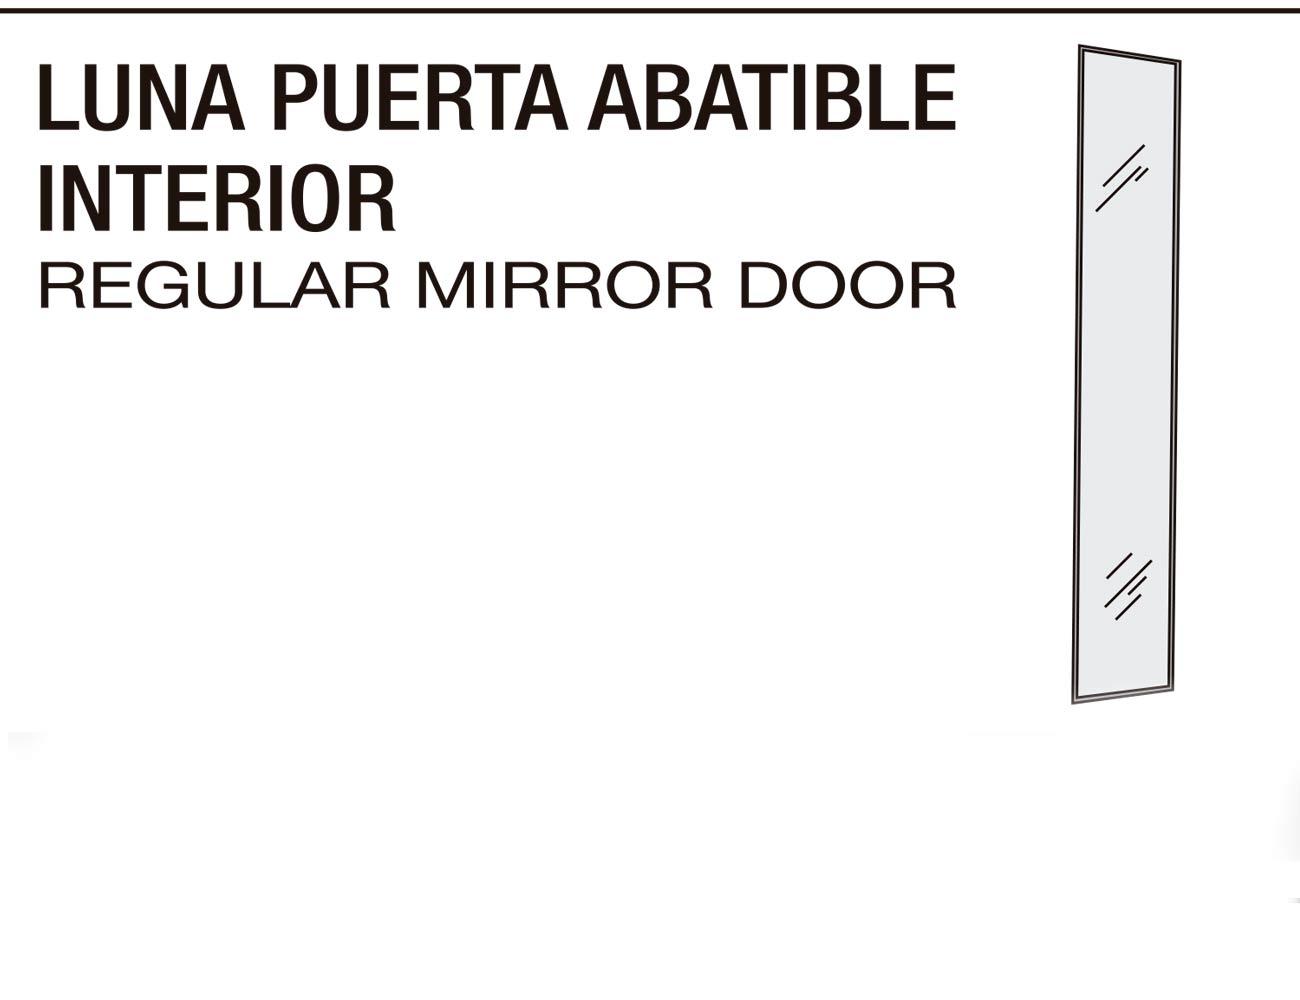 Luna puerta abatible interior1